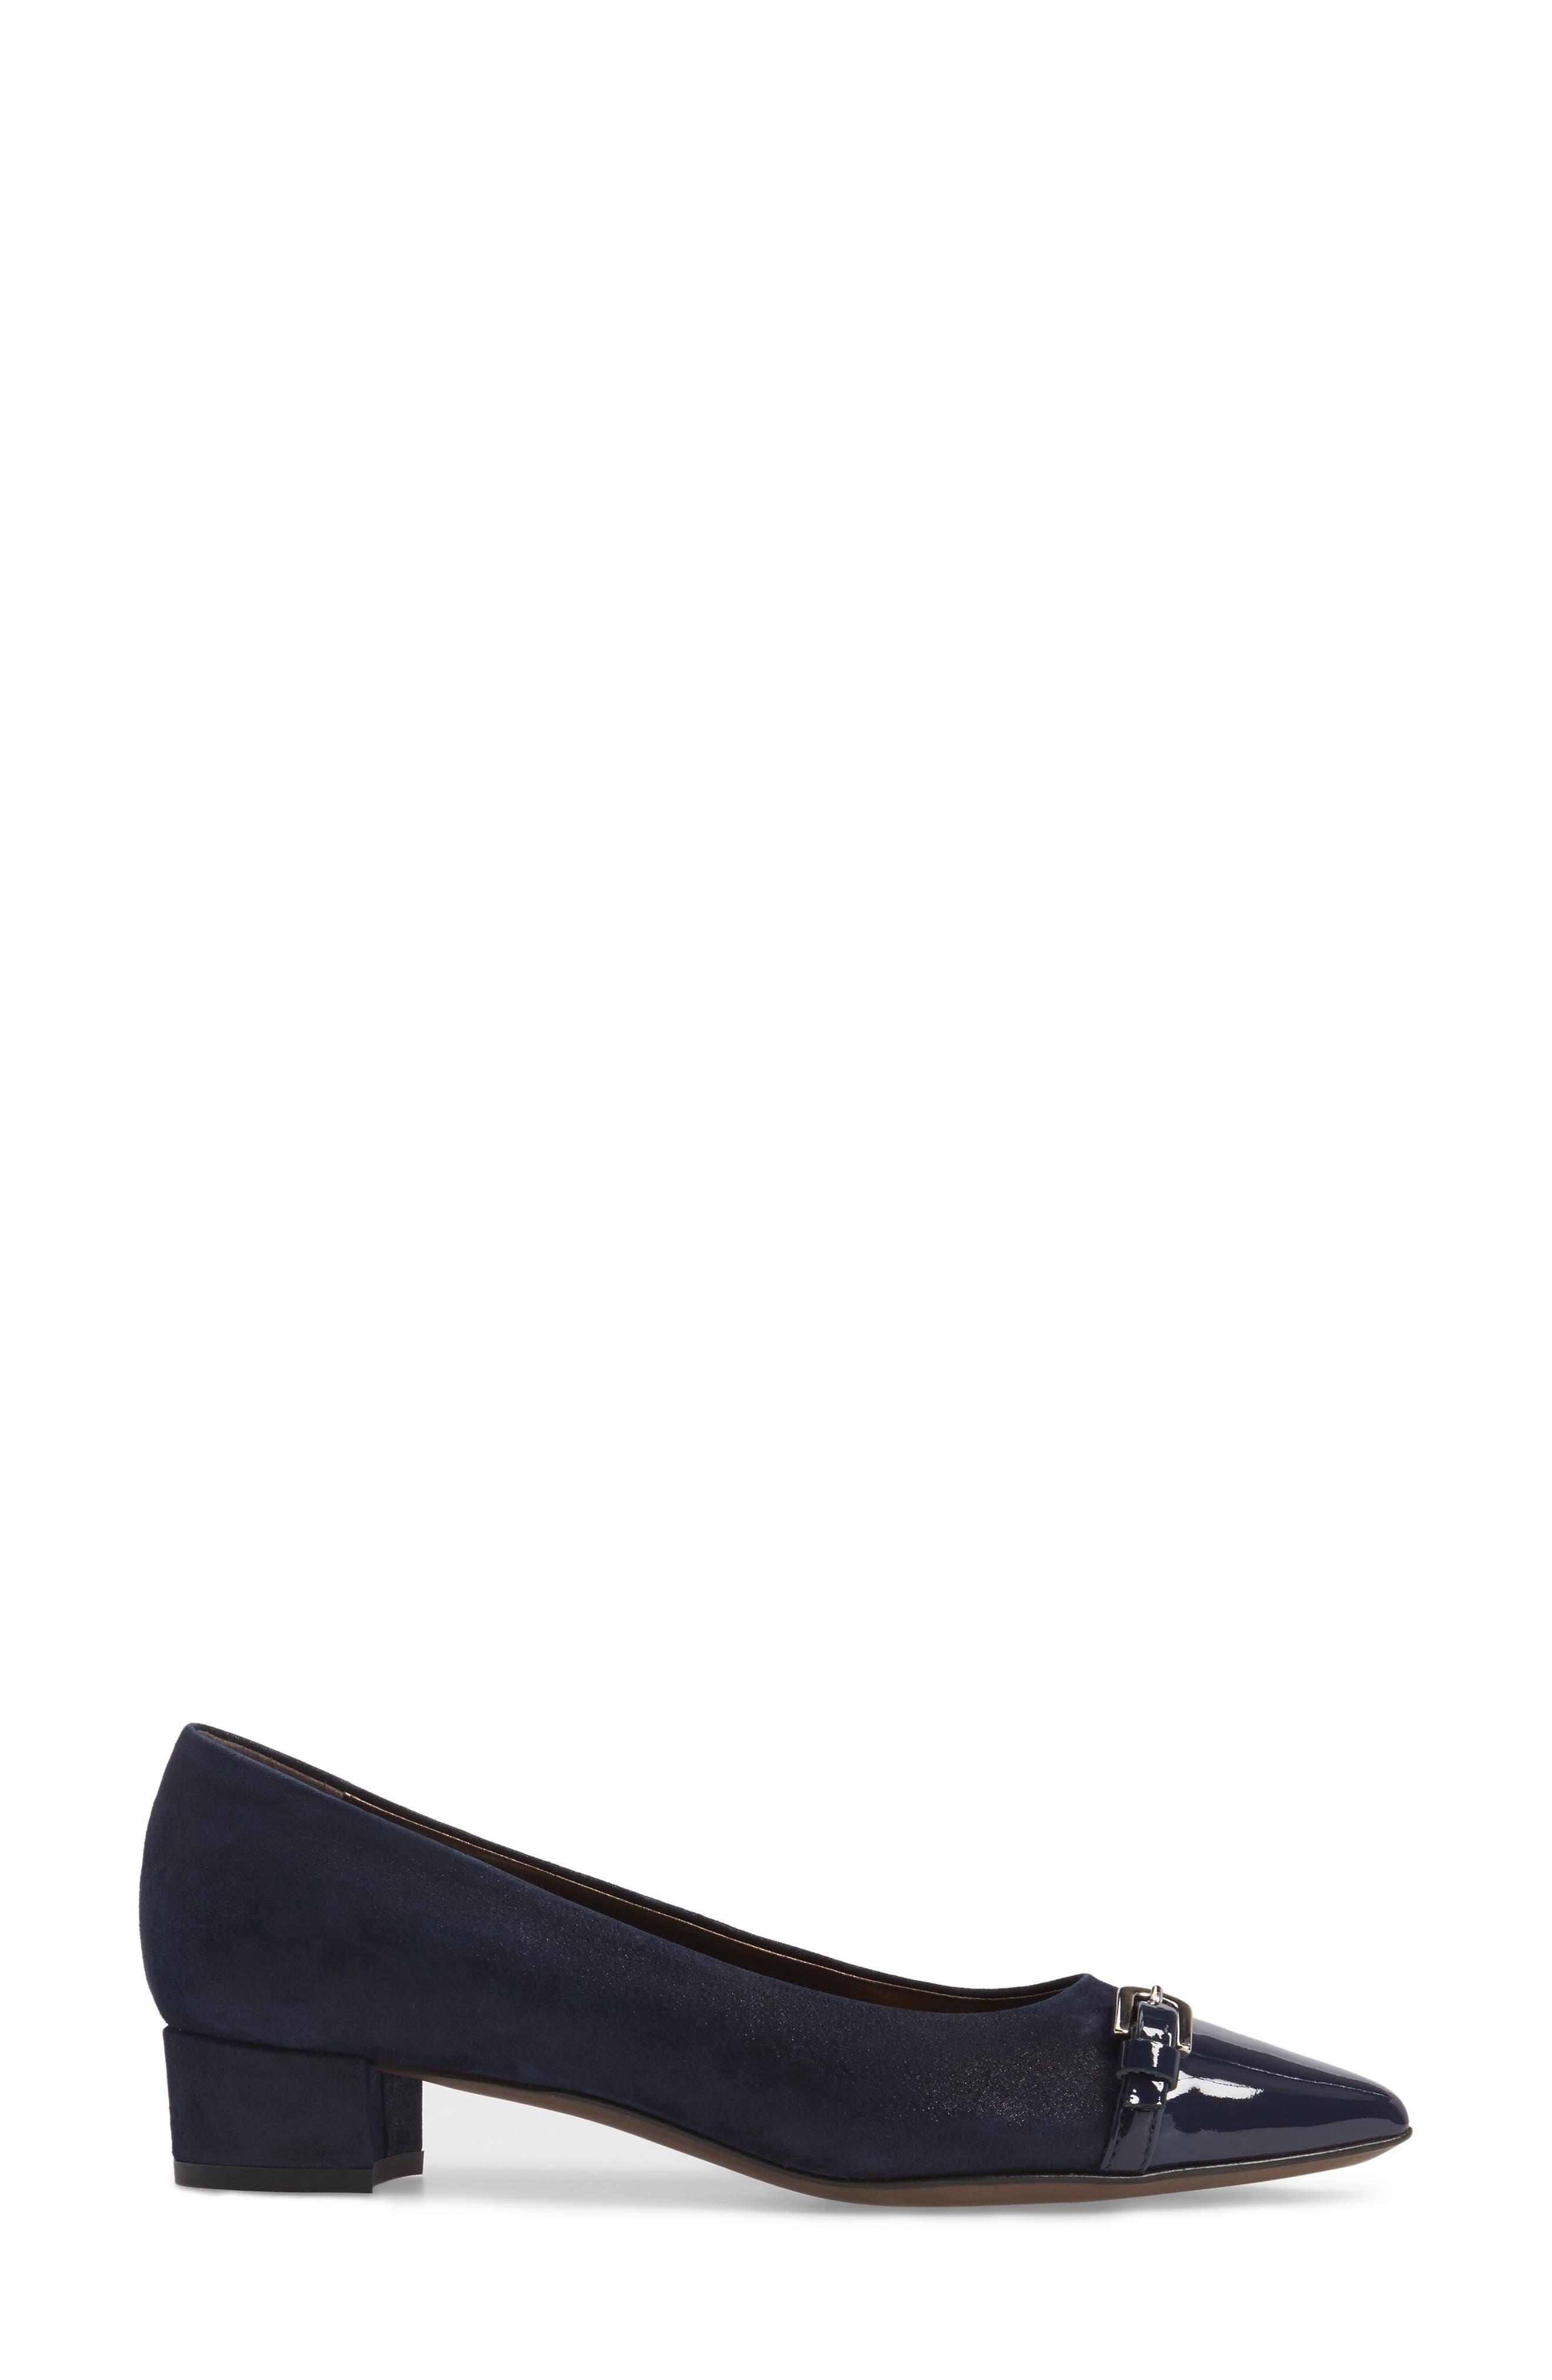 Belted Block Heel Pump,                             Alternate thumbnail 4, color,                             Night Shimmer Leather